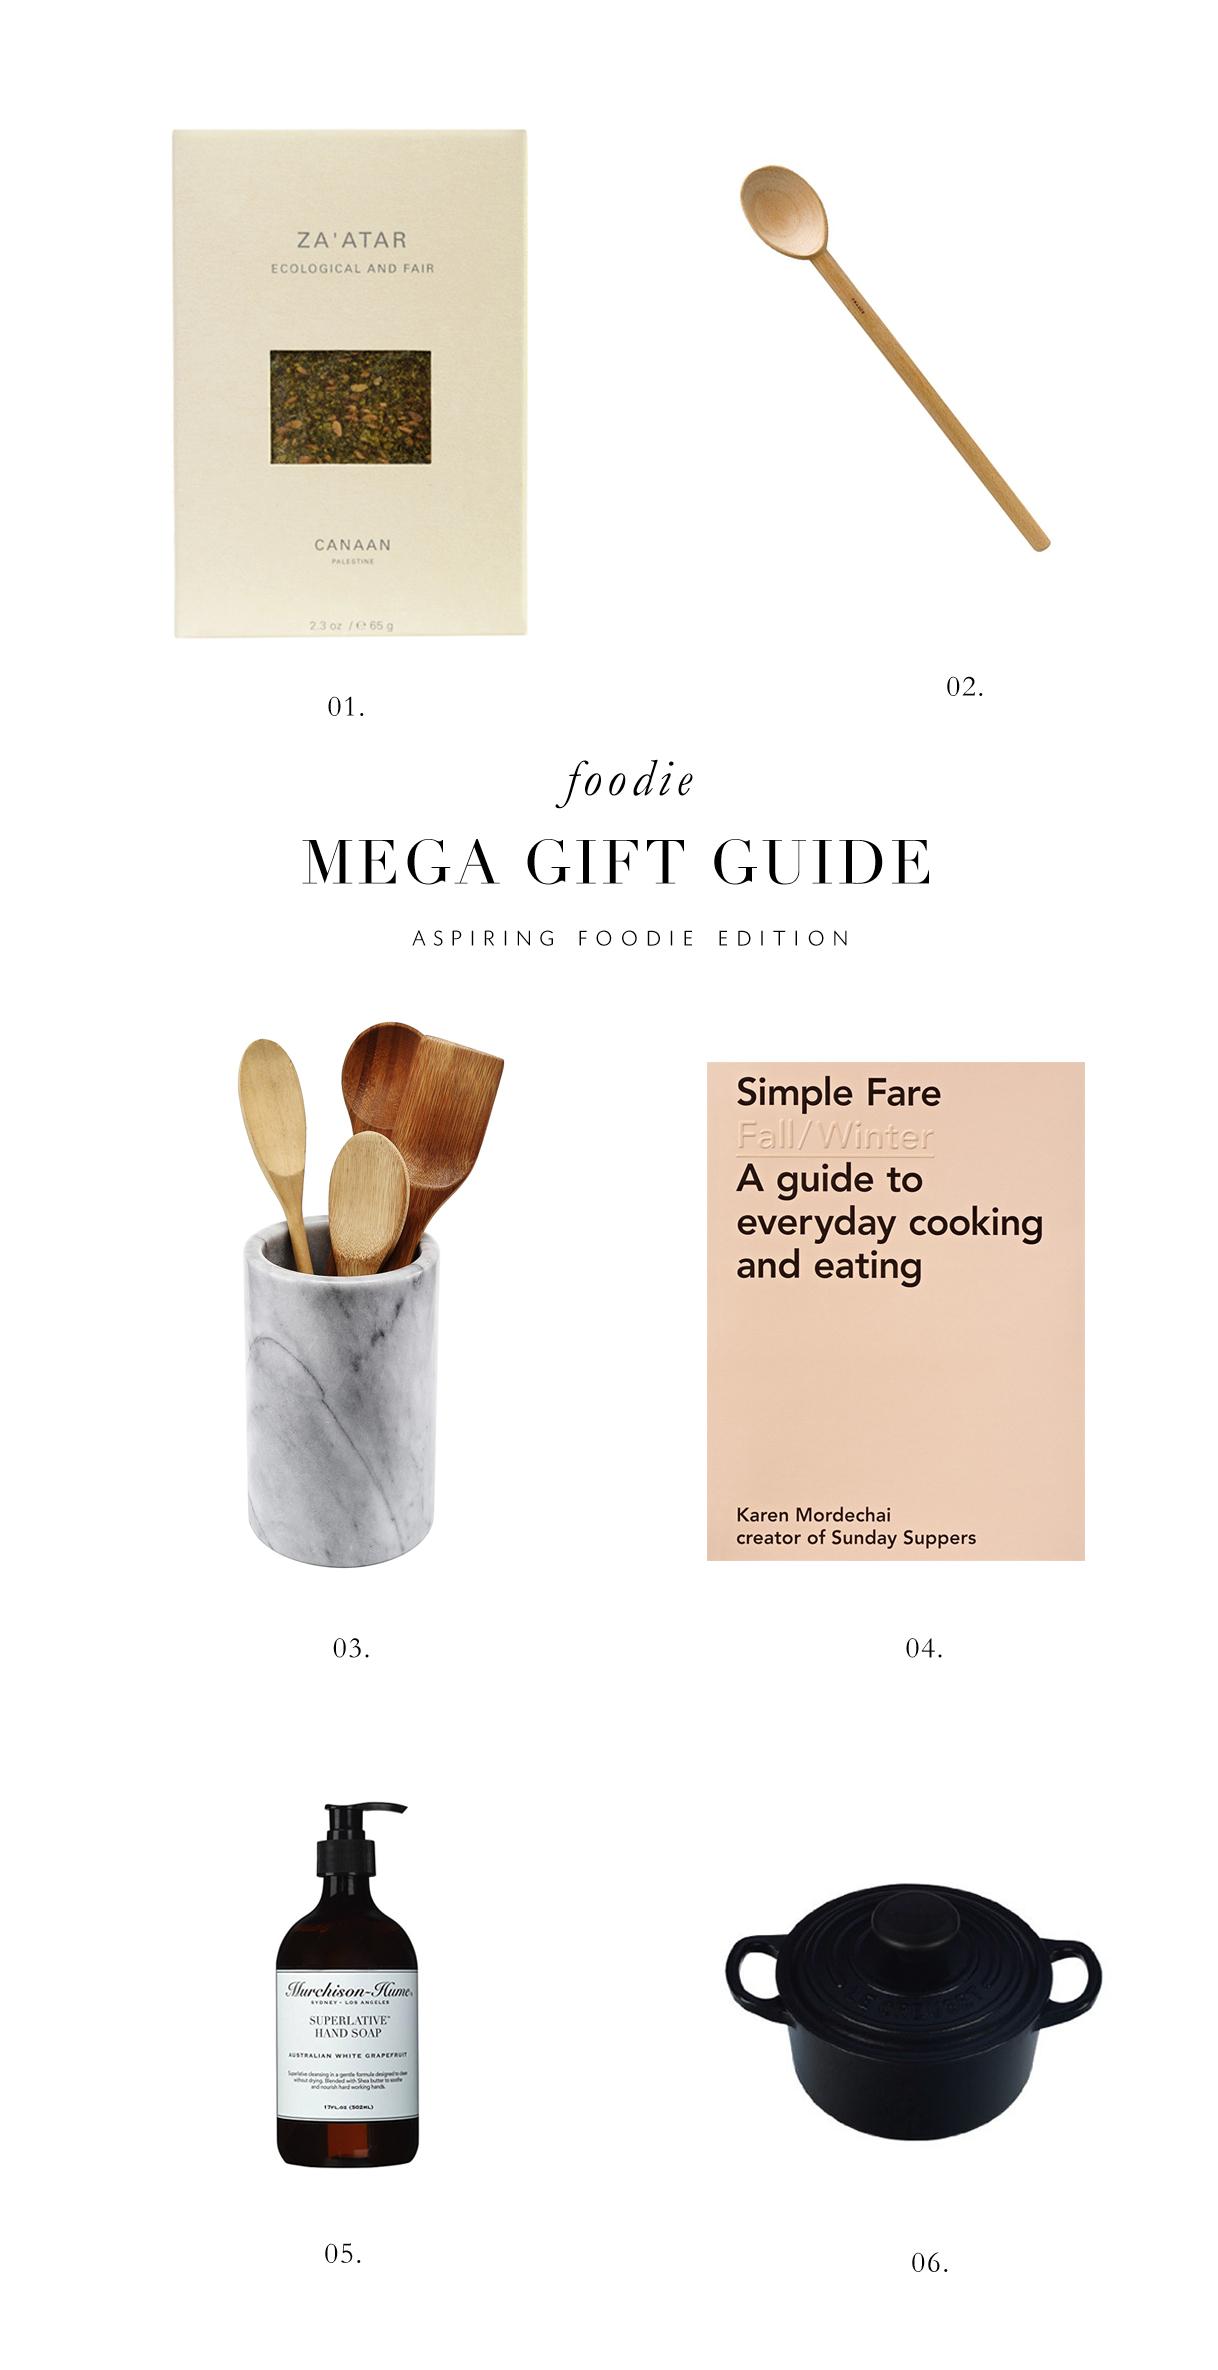 aspiring foodie gift guide via besottedblog